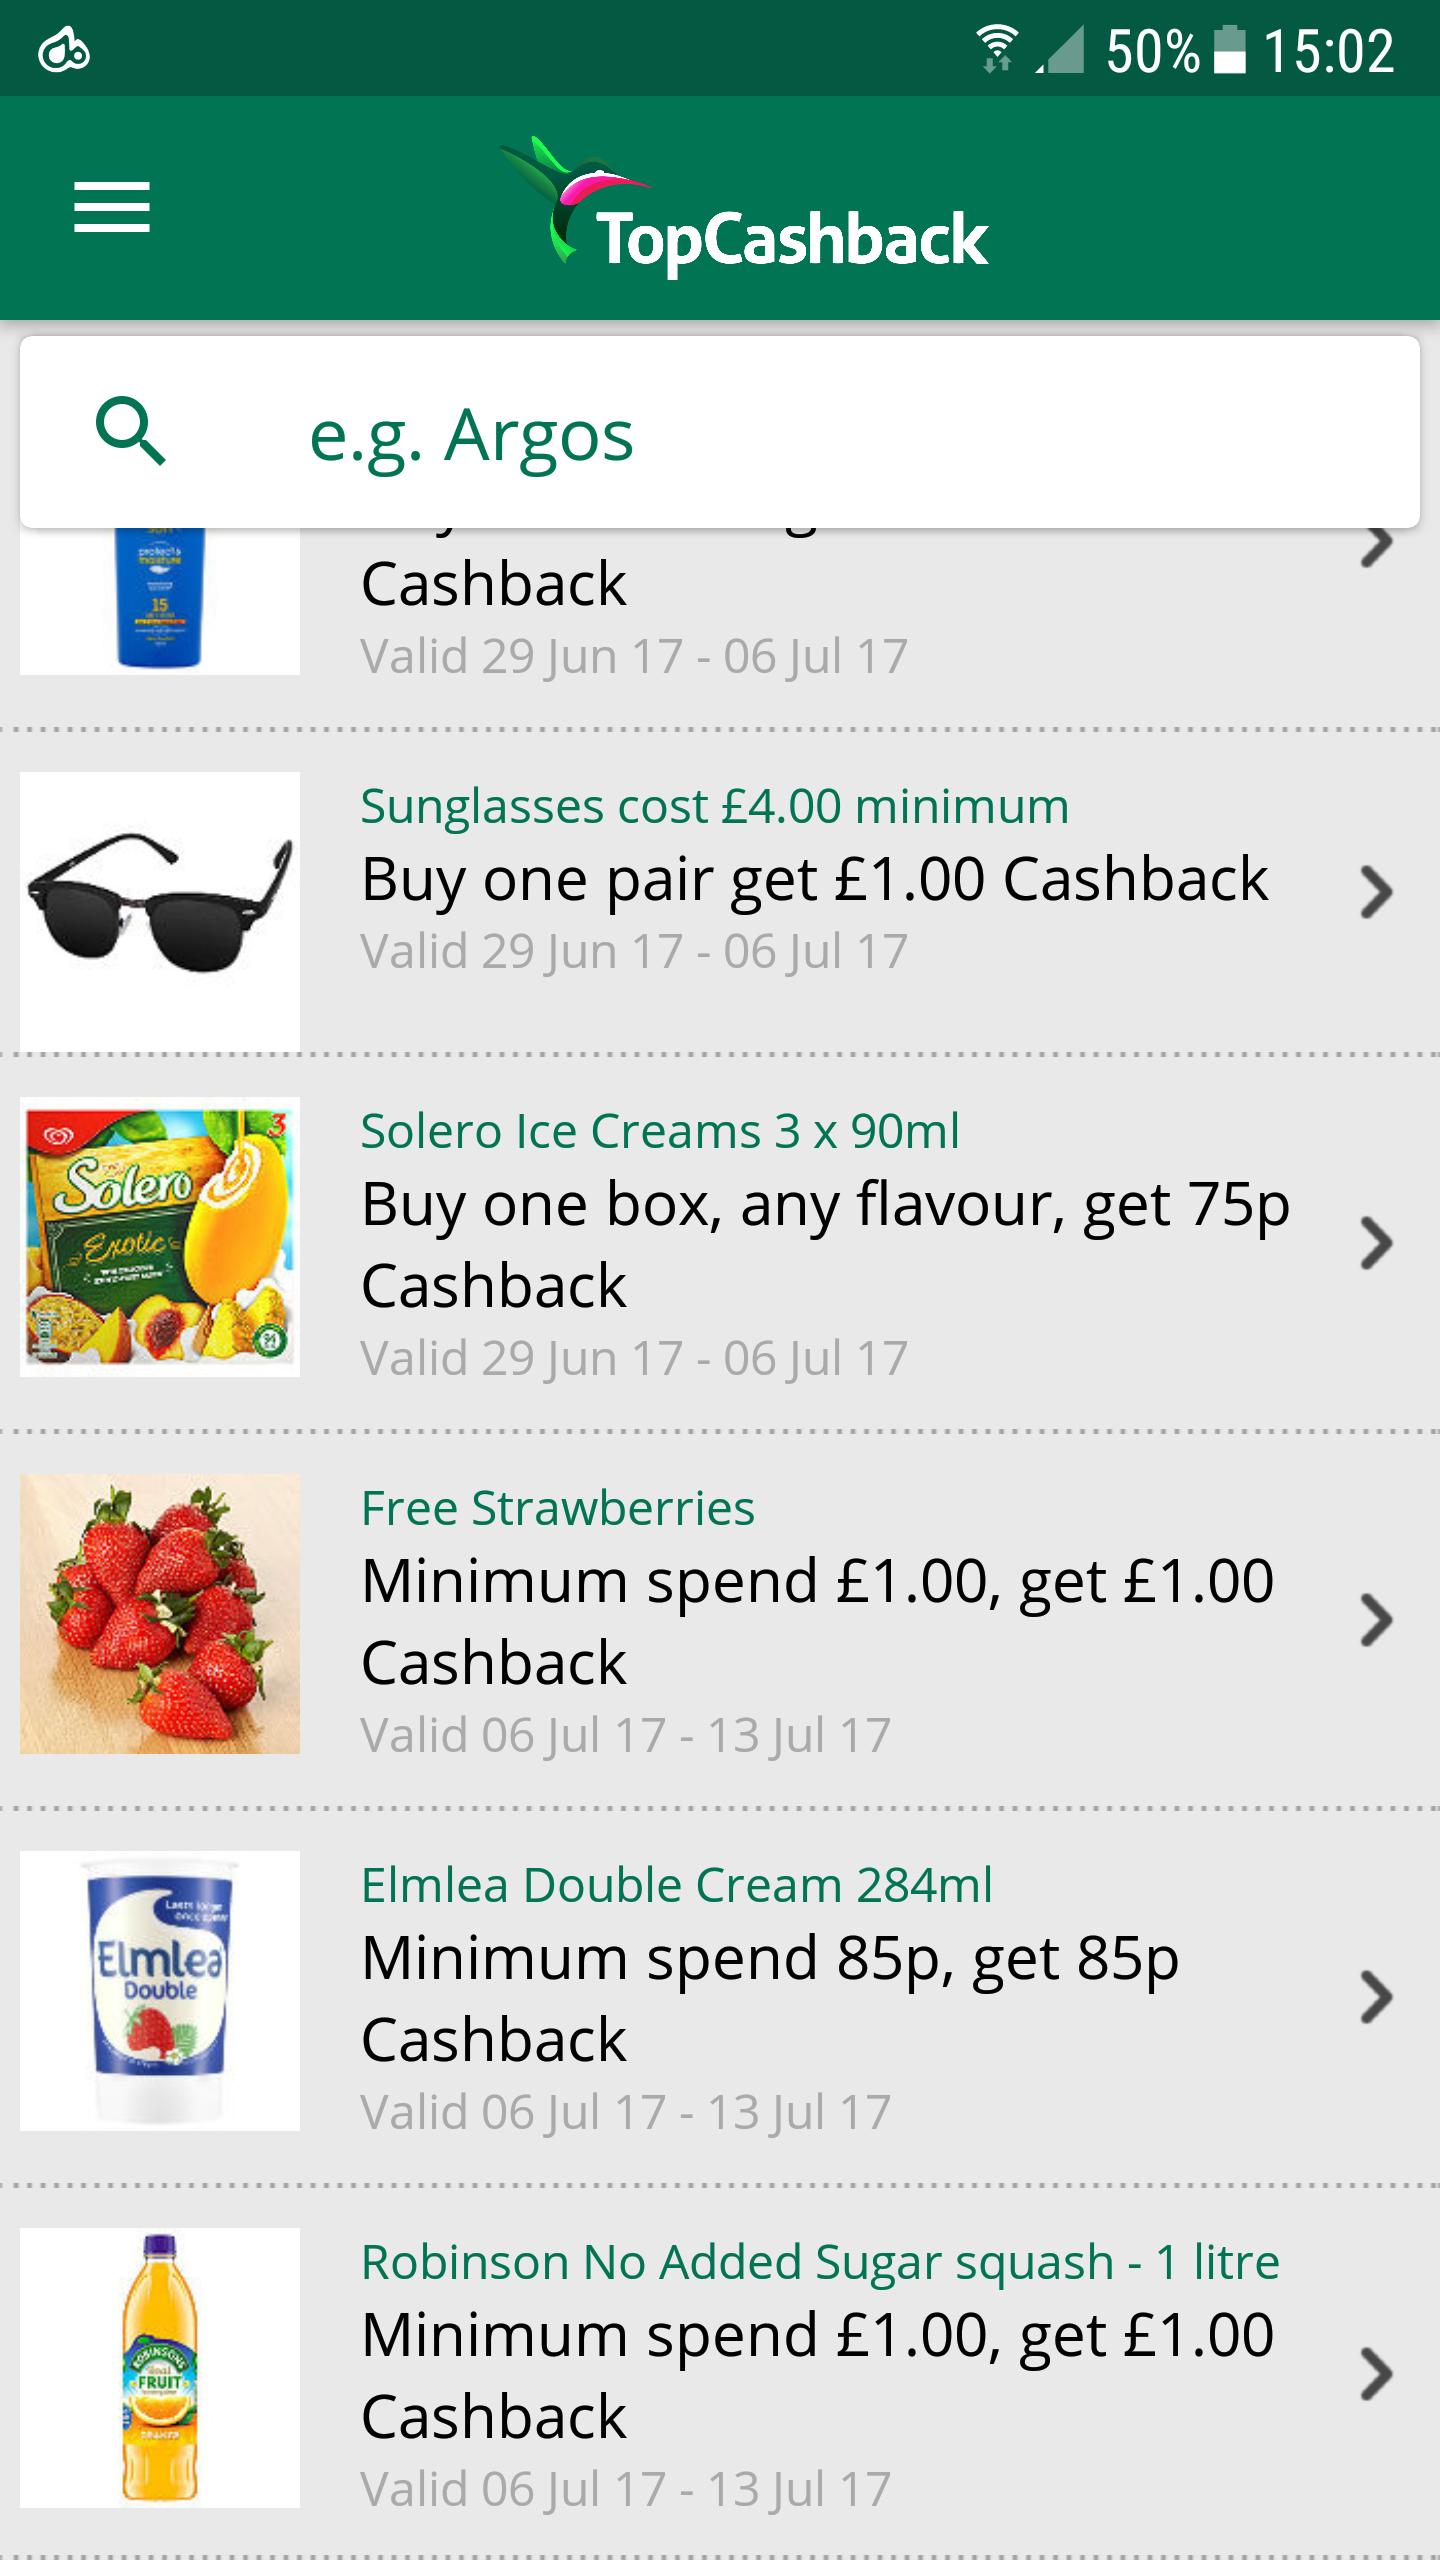 cash back on Wimbledon faves at topcashback e.g Robinsons NAS squash £1.00 in Asda/Morrisons/Coop so free after cashback.